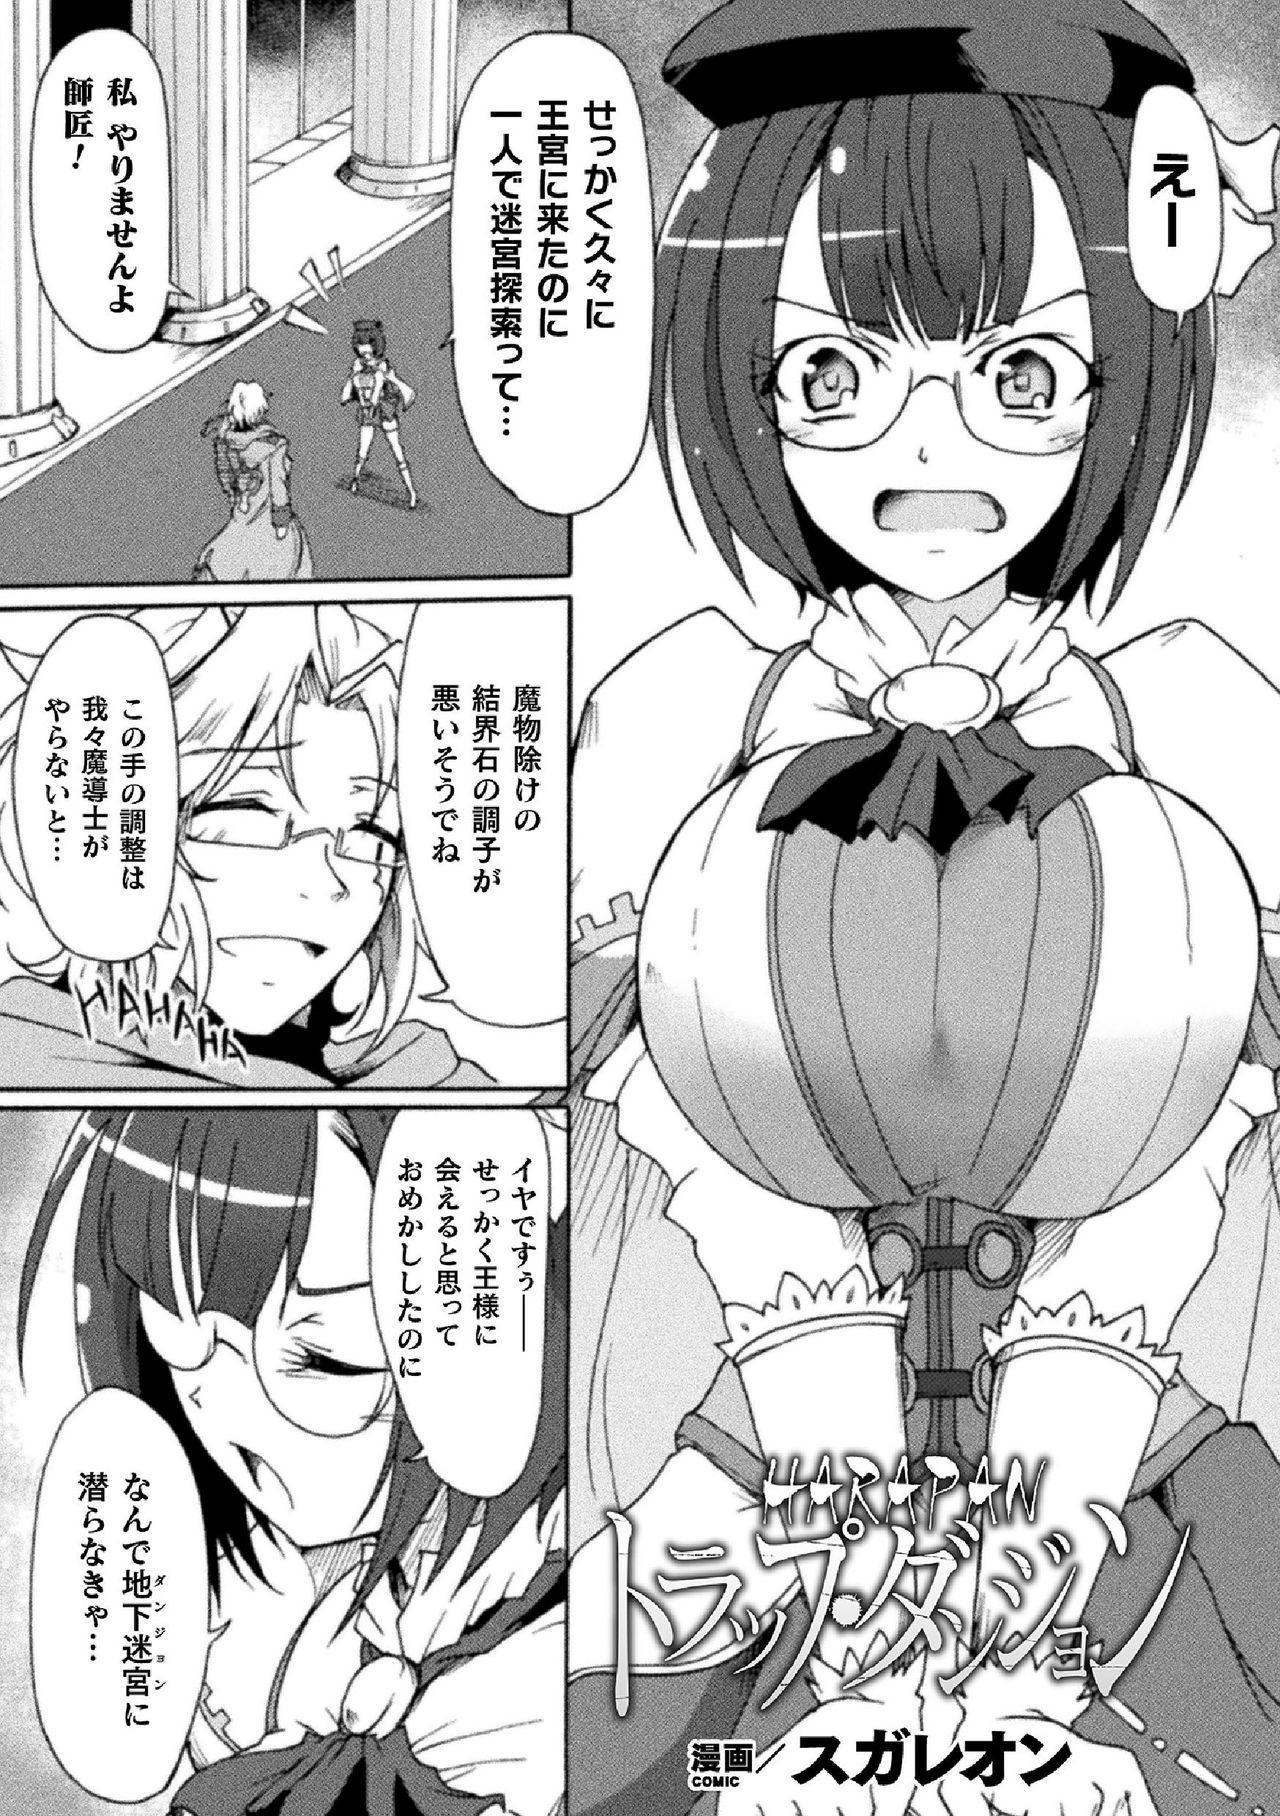 2D Comic Magazine Namaiki Onna ni HaraPun Seisai! Vol. 2 22